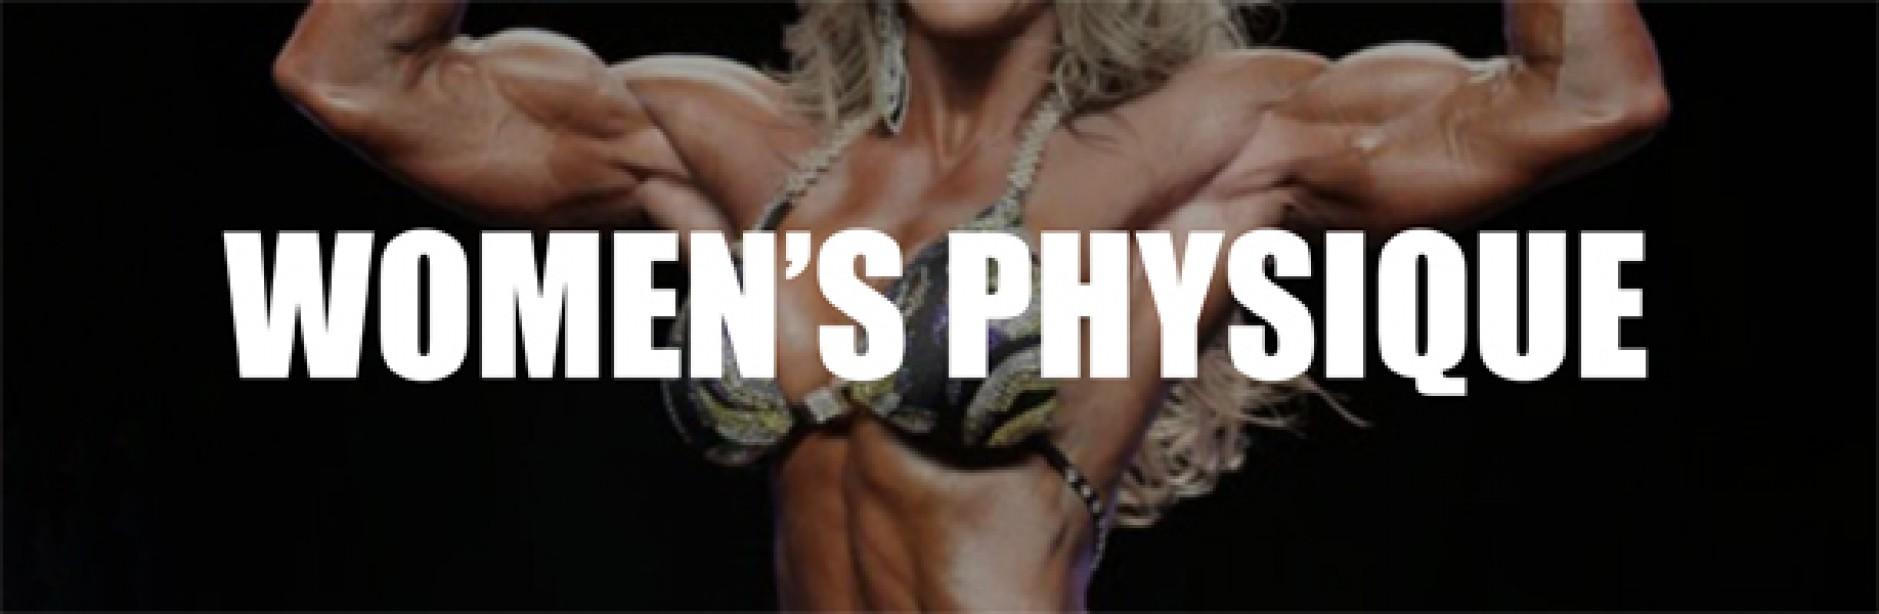 2015 NPC USA Championships Women's Physique Call Out Report